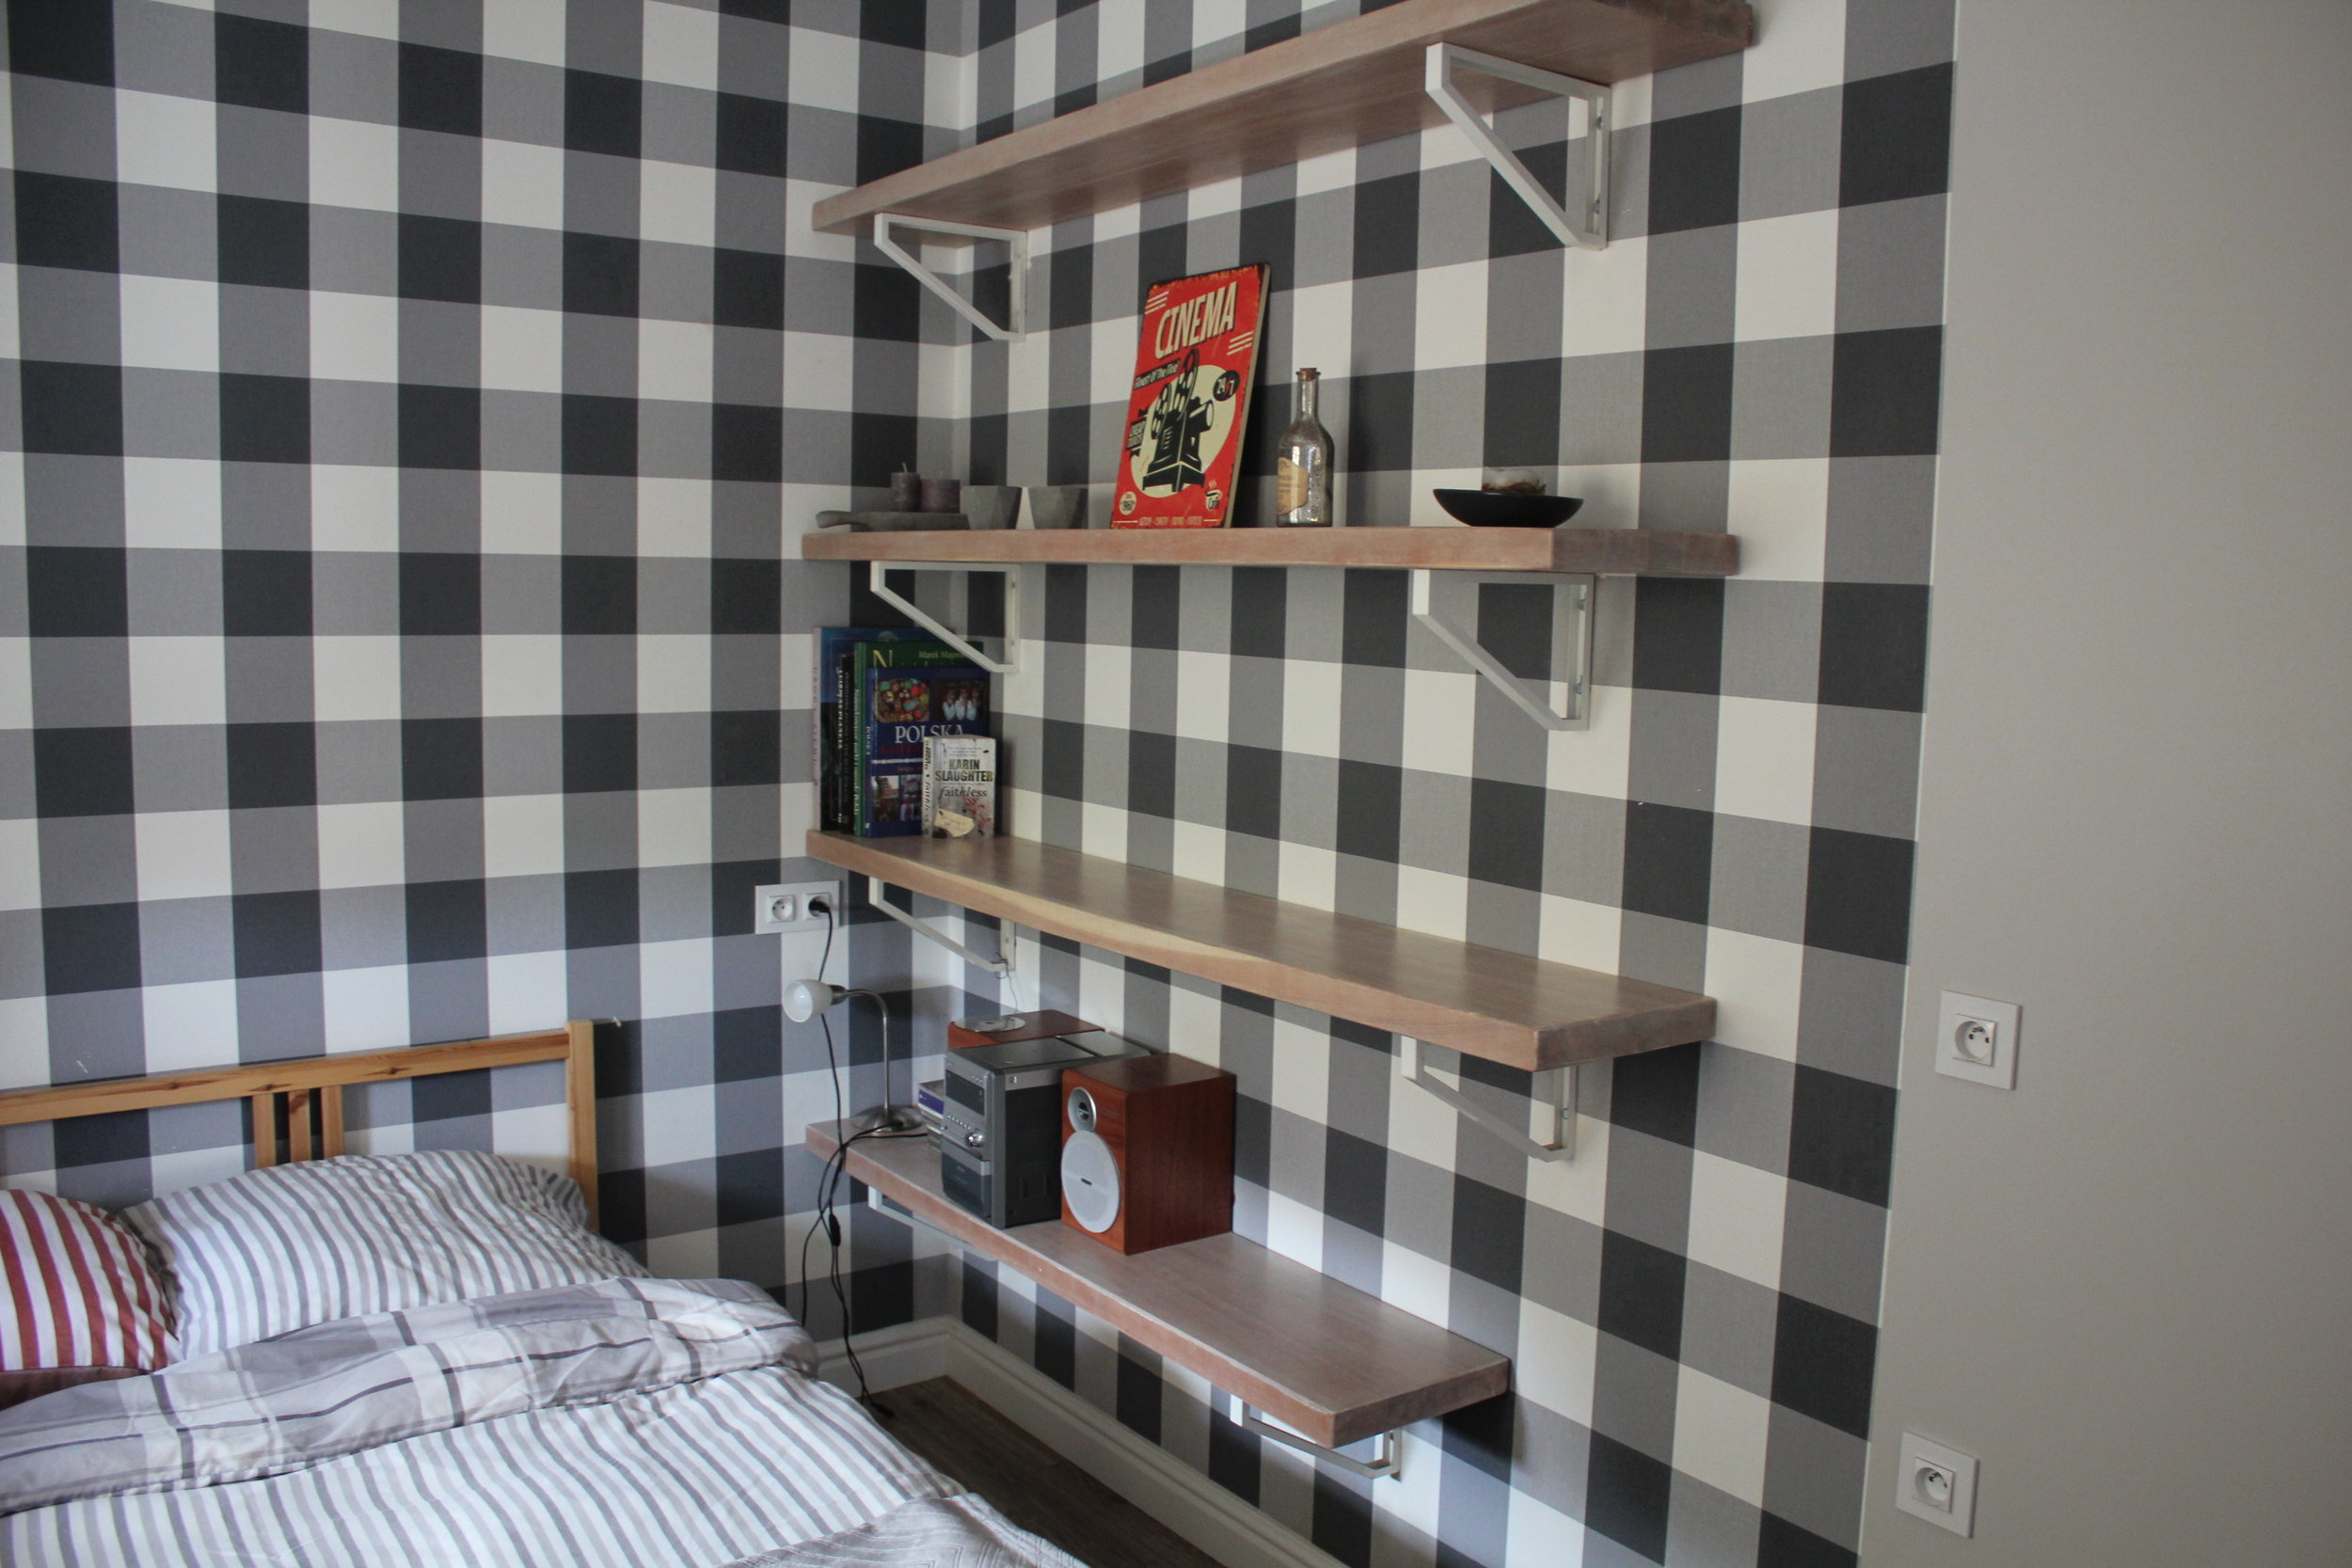 Apartament na Mariensztacie – Bookshelf